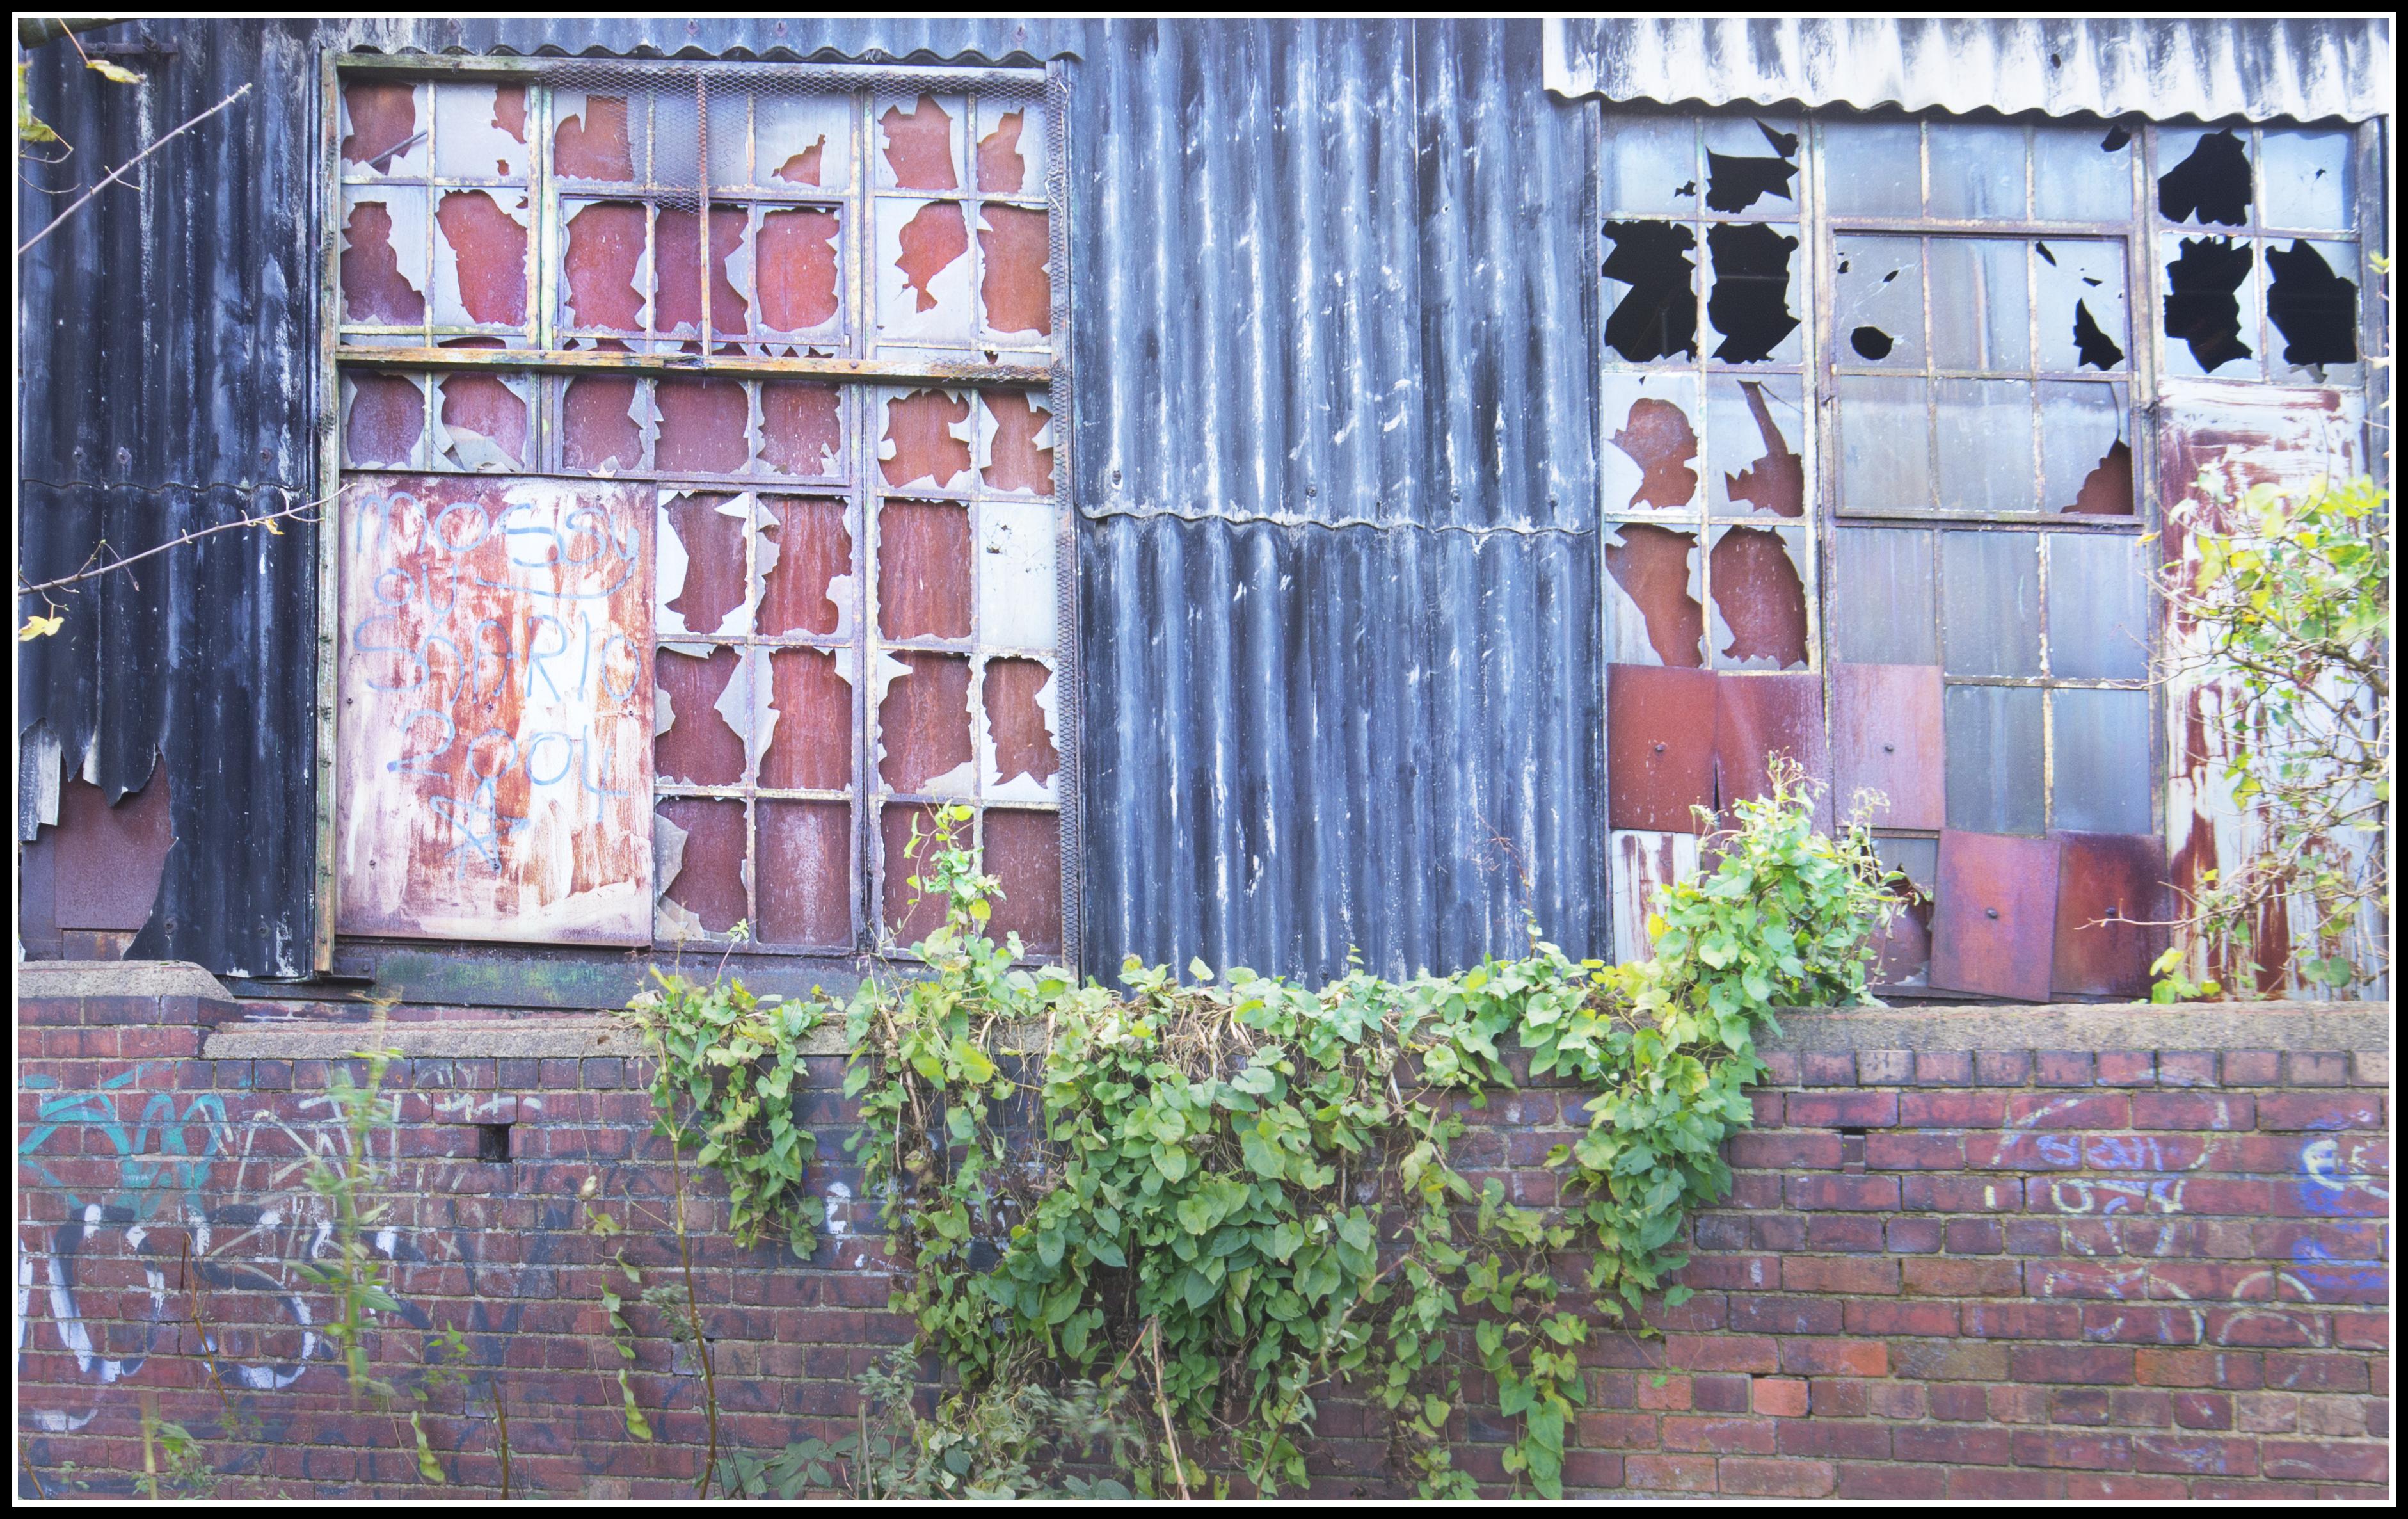 Fotos gratis : planta, calle, casa, ventana, pared, moho, rojo ...